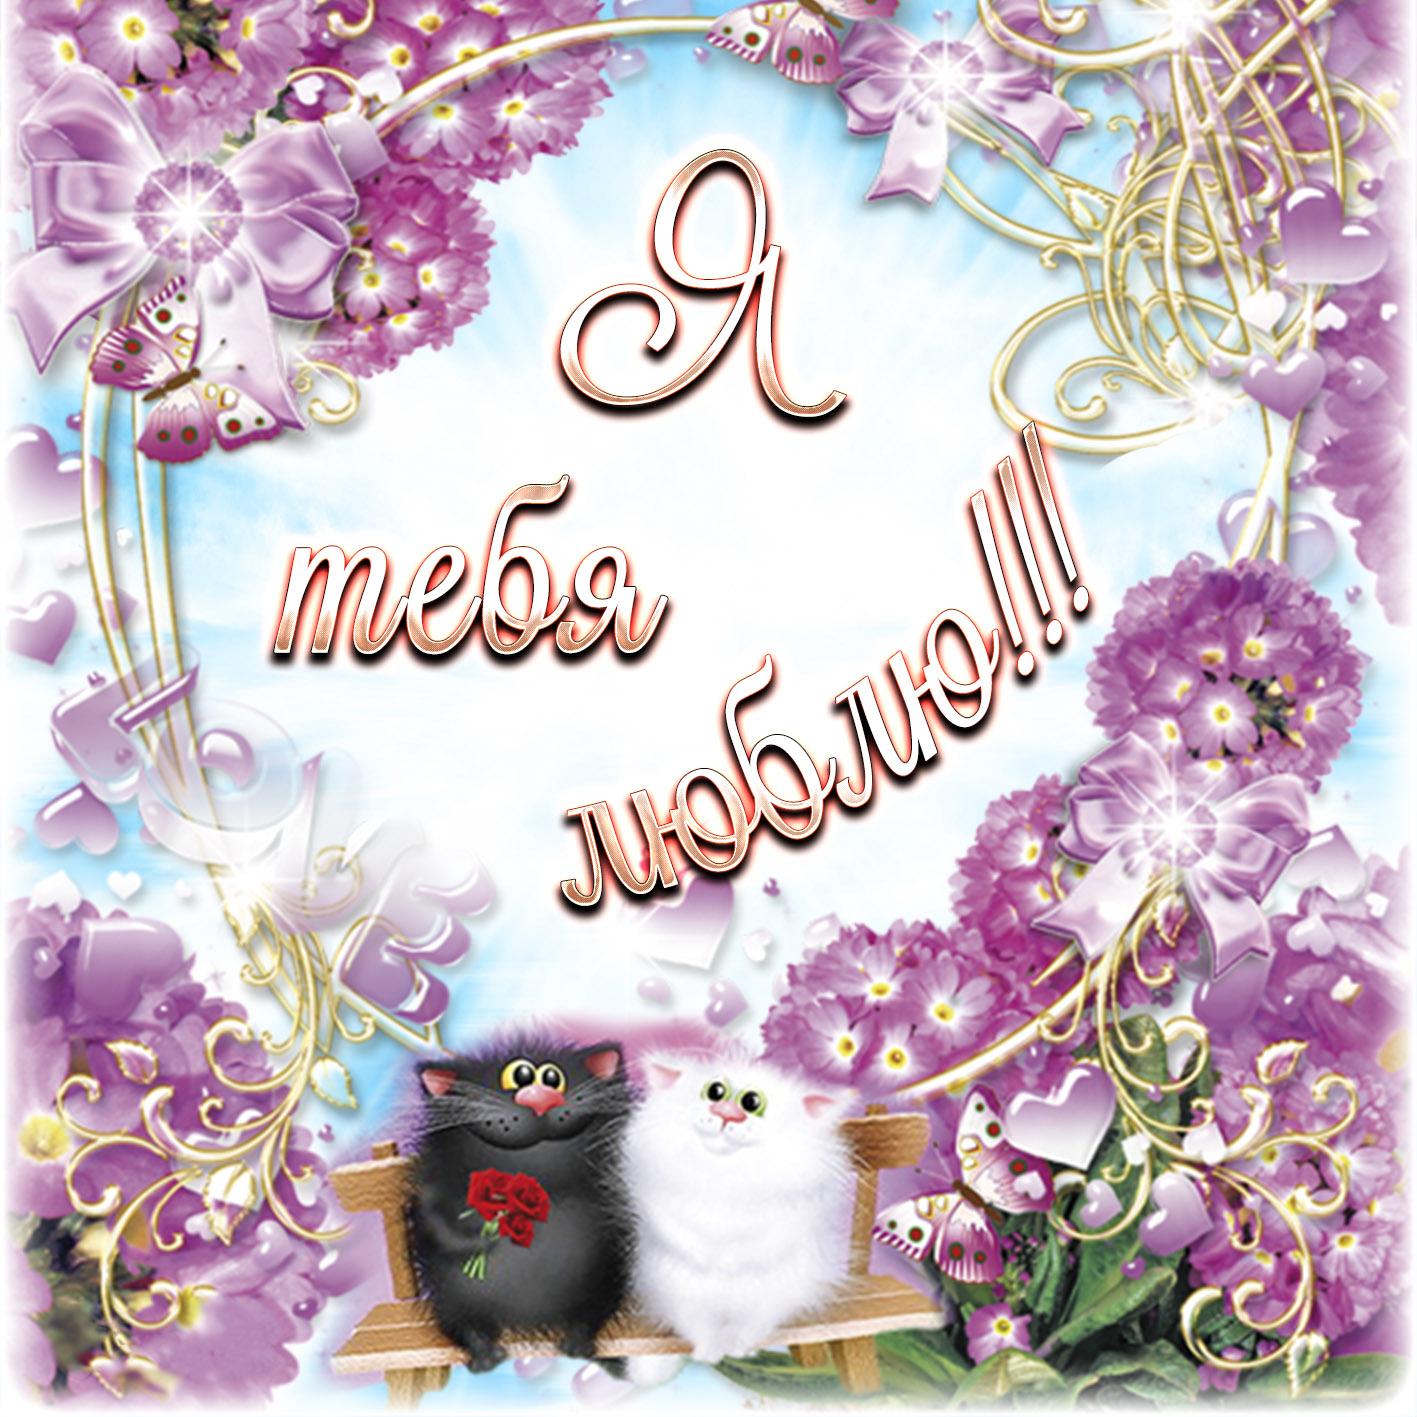 Открытка люблю - котики на скамеечке среди цветочков